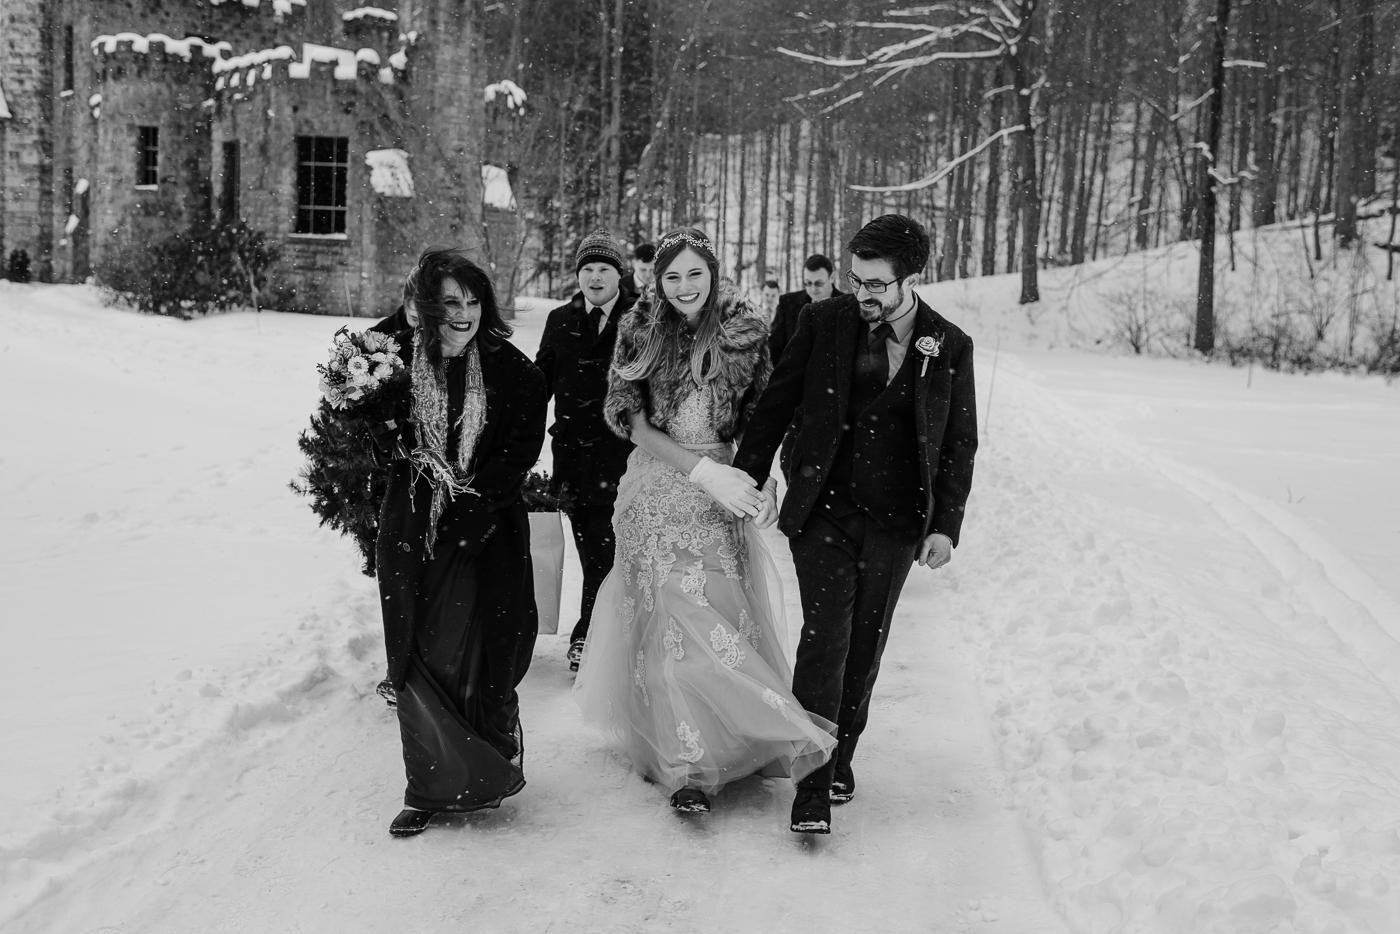 Squires-Castle-Winter-Wedding-39.jpg